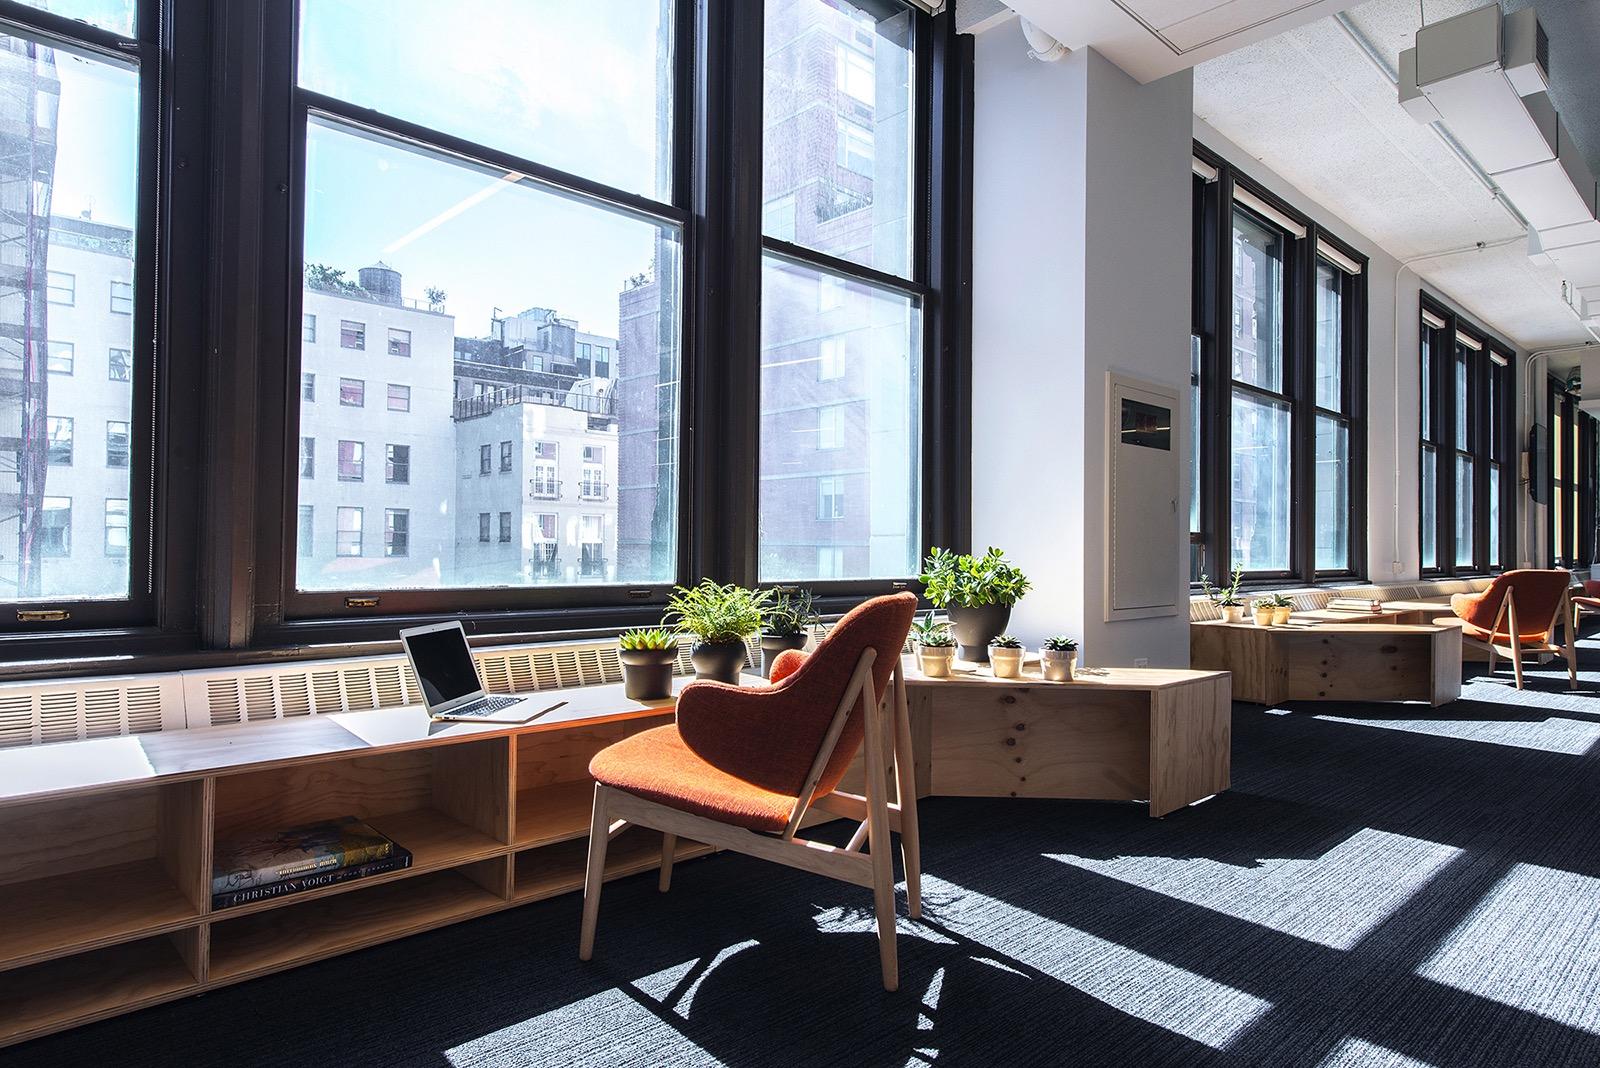 qz-office-nyc-5